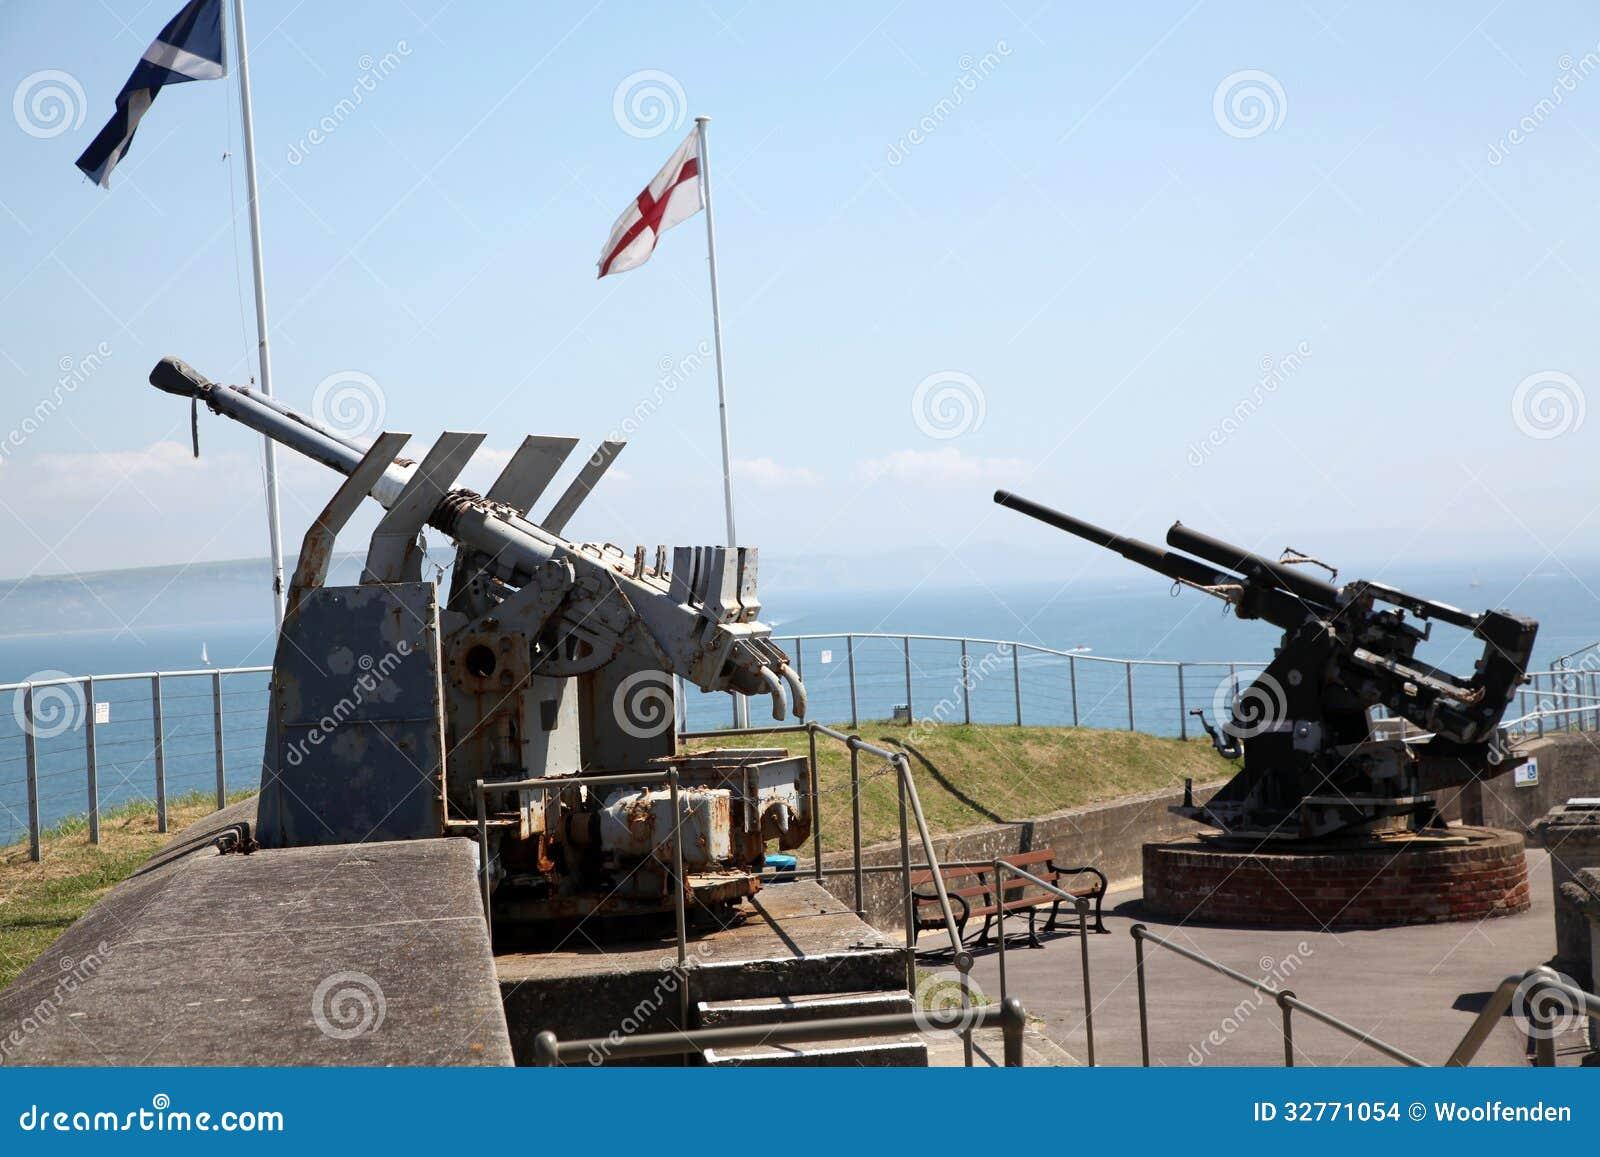 nothe fort guns armaments overlooking aircraft anti coast england south